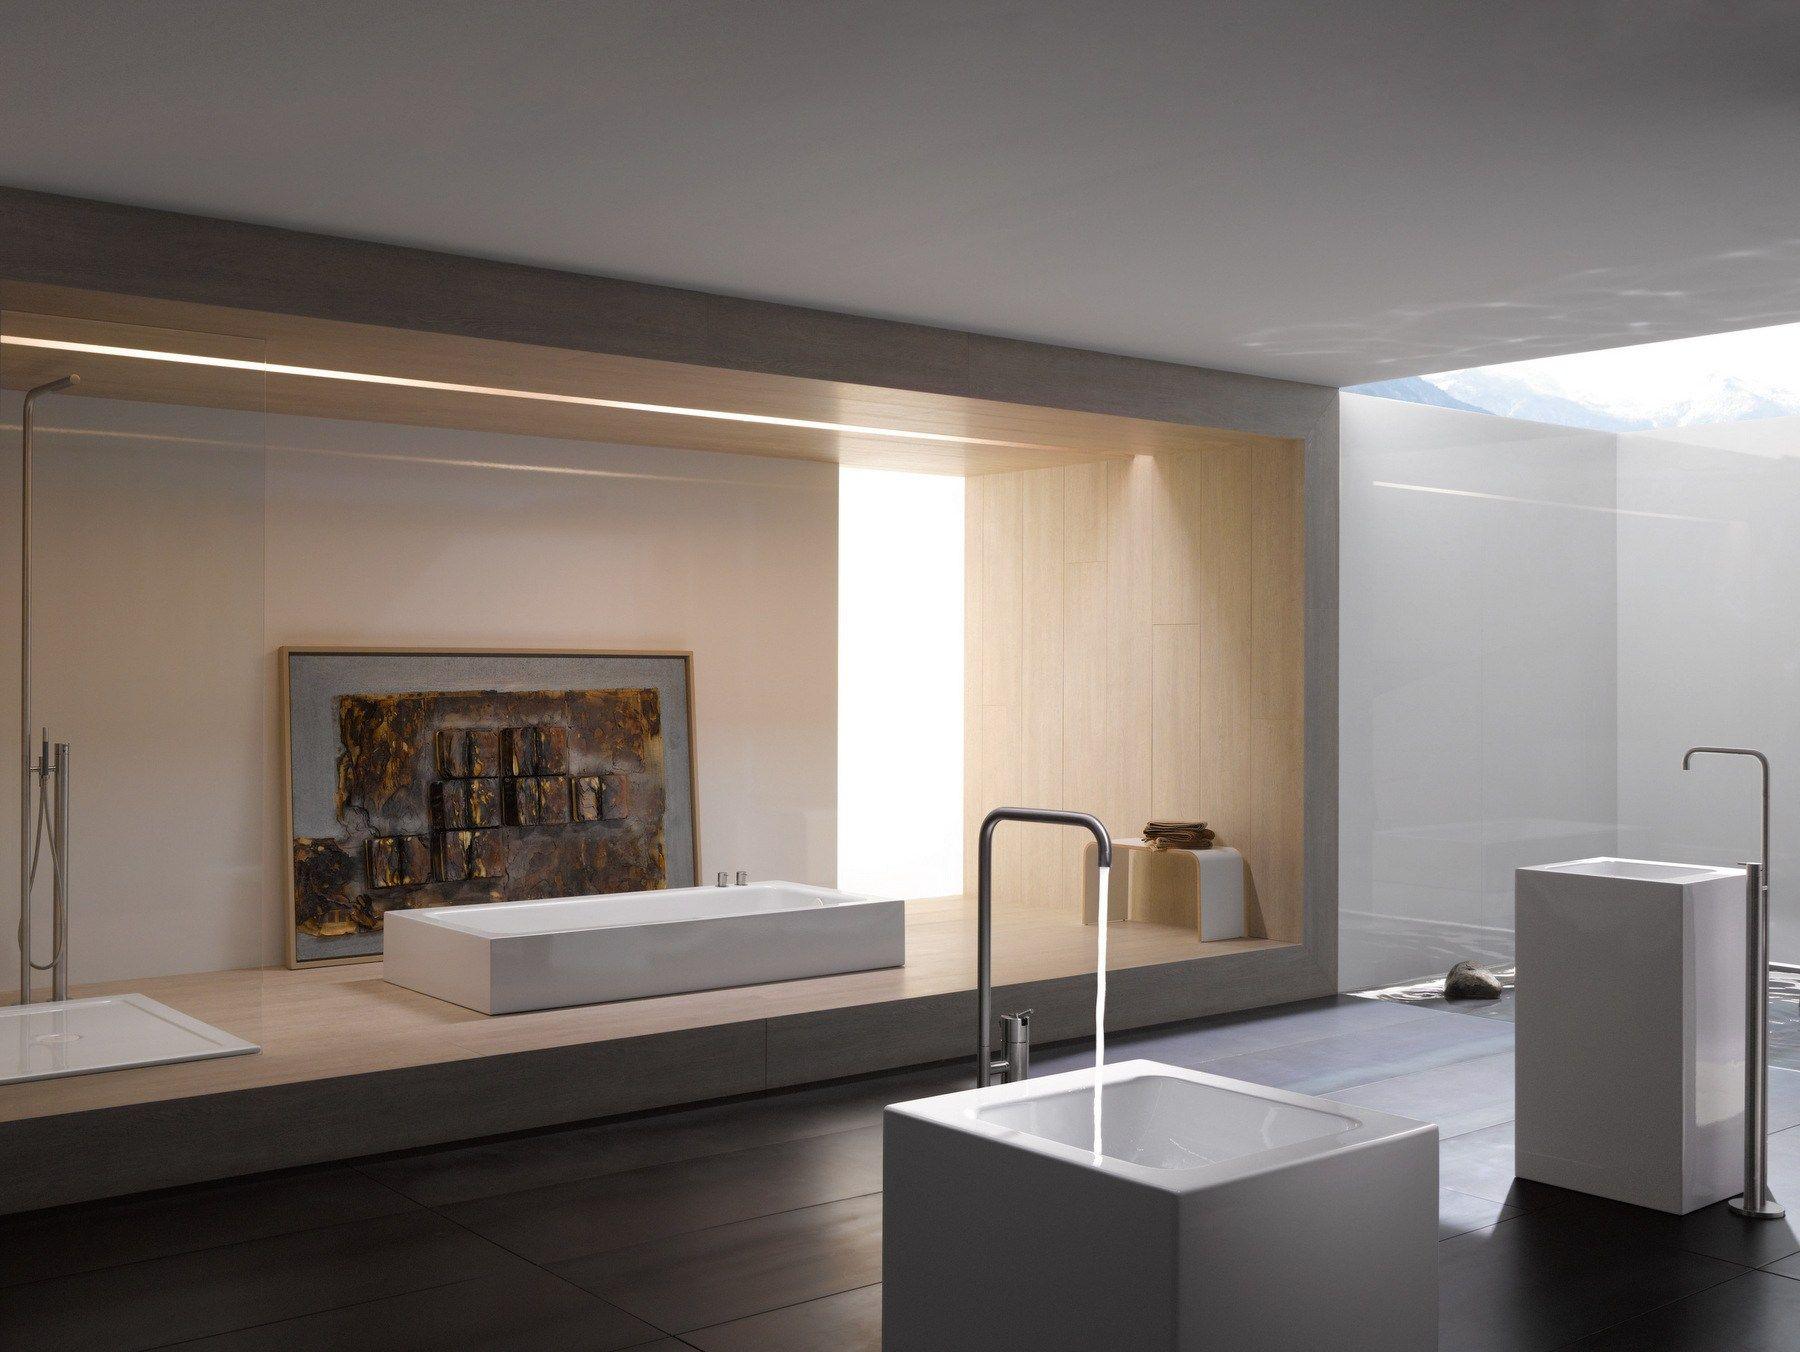 Vasca Da Bagno Relax : Semi inset bathtub betteone relax highline by bette design tesseraux